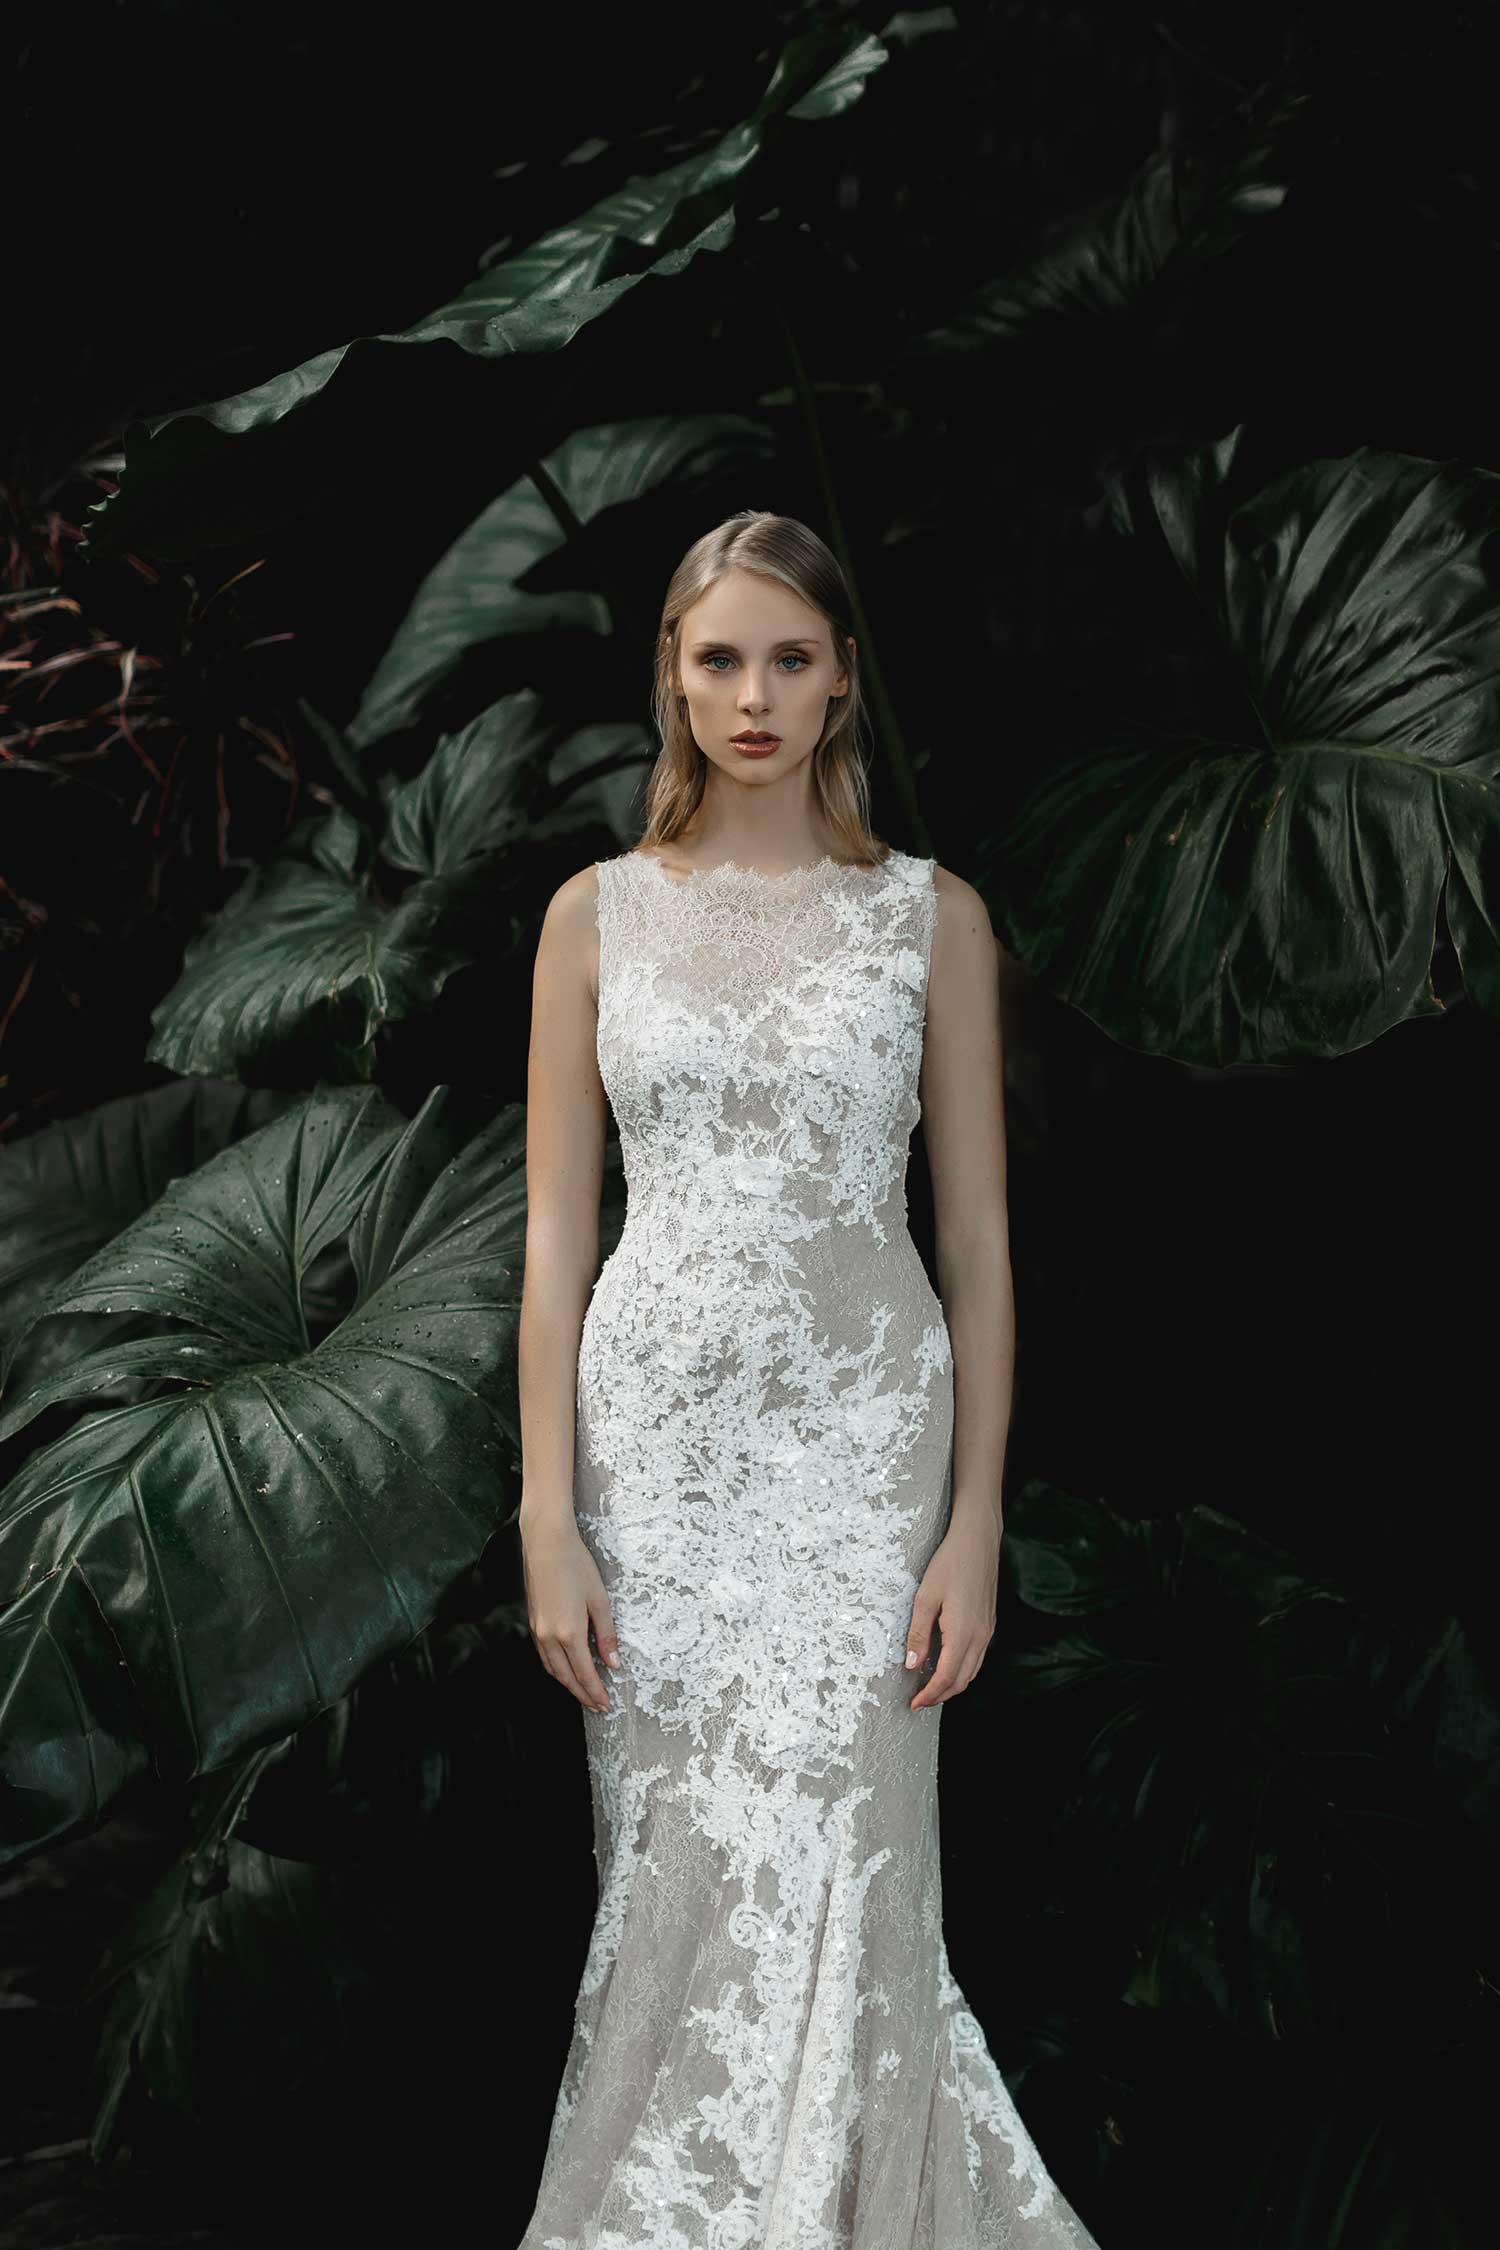 A modern bridal look